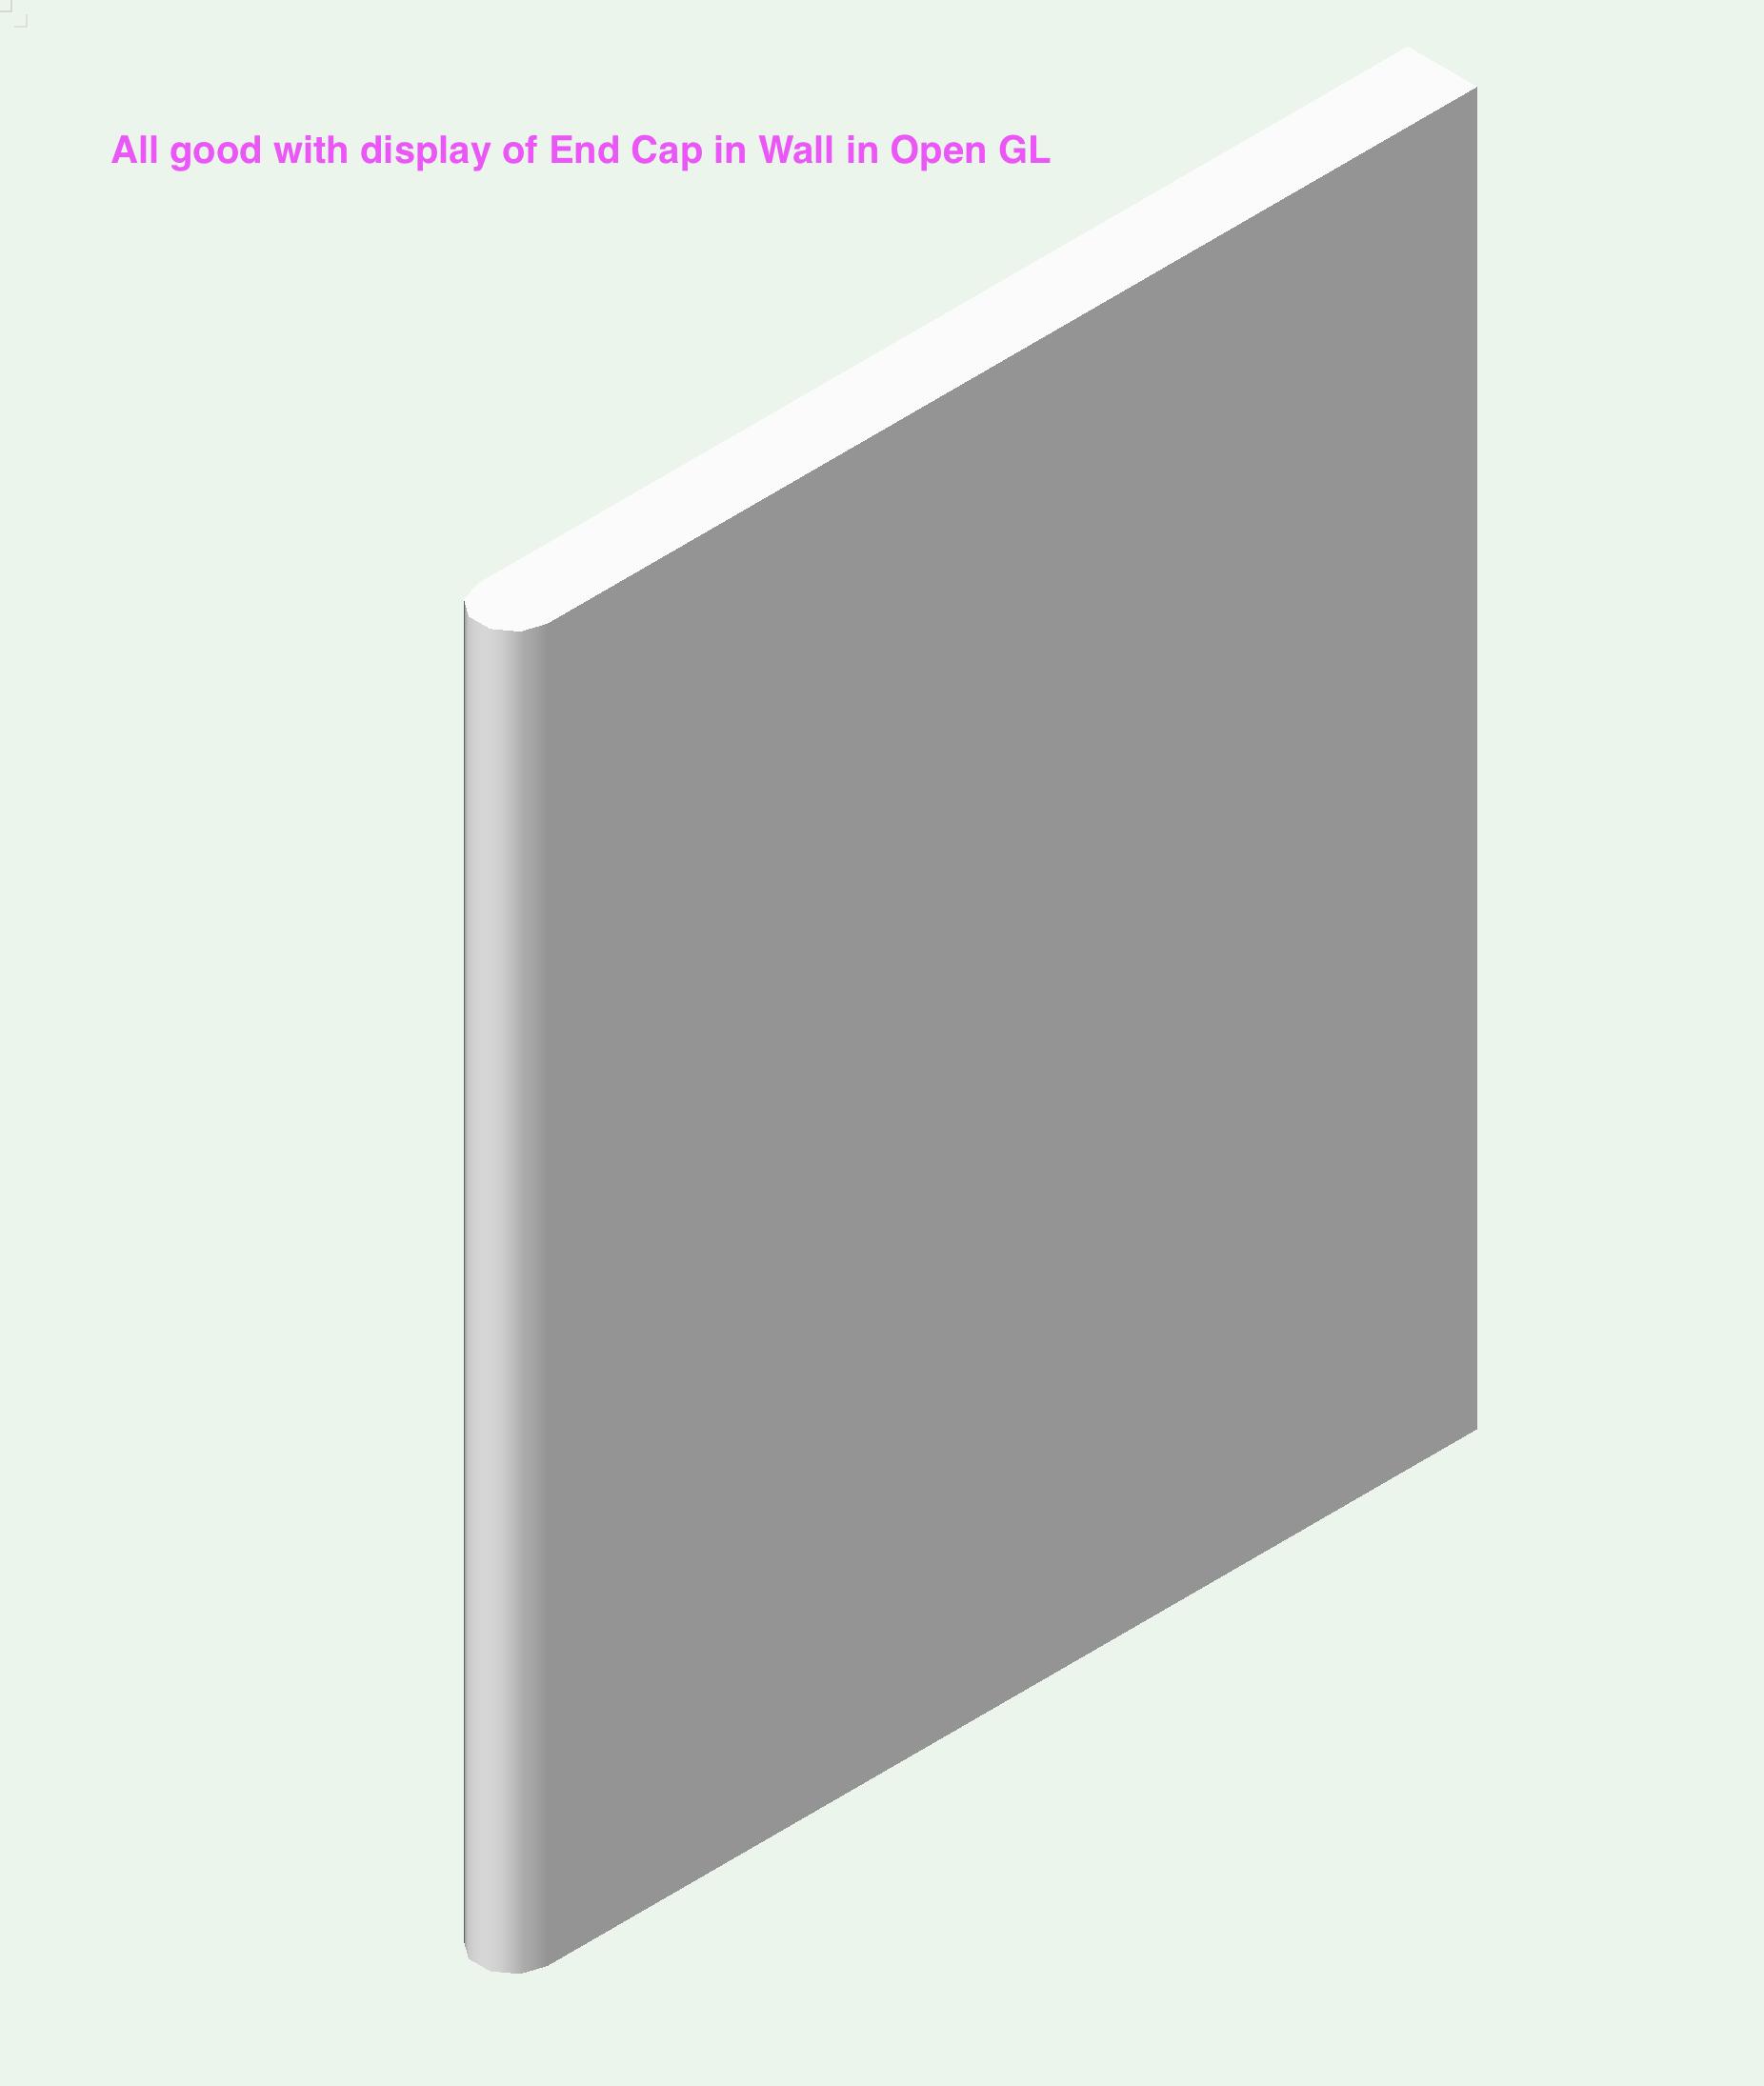 OpenGL End Cap.png